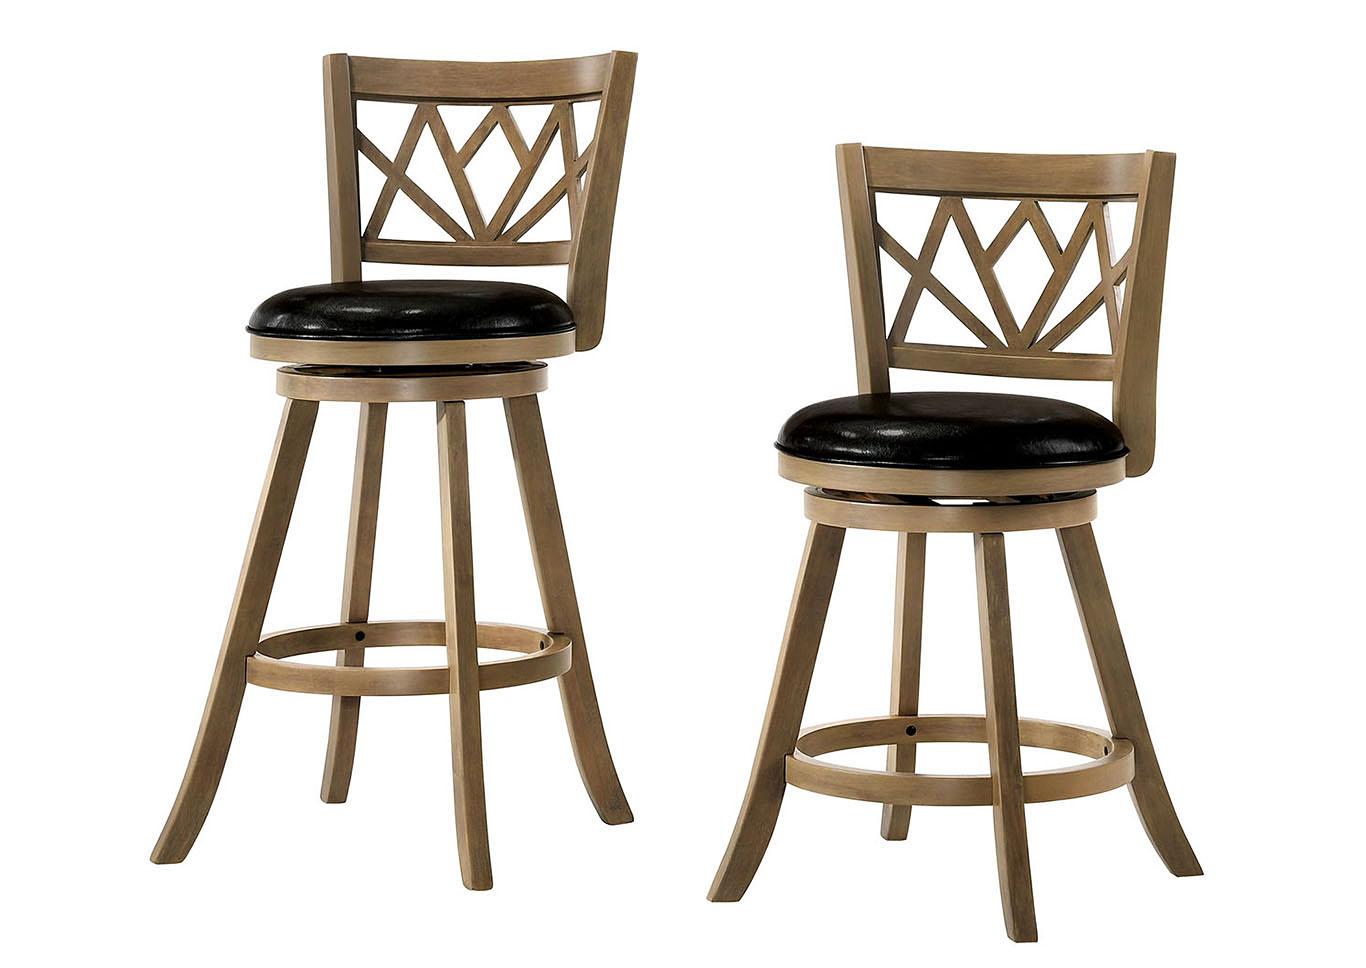 Just Furniture Dazey Oak 24 Swivel Barstool Wpadded Seat